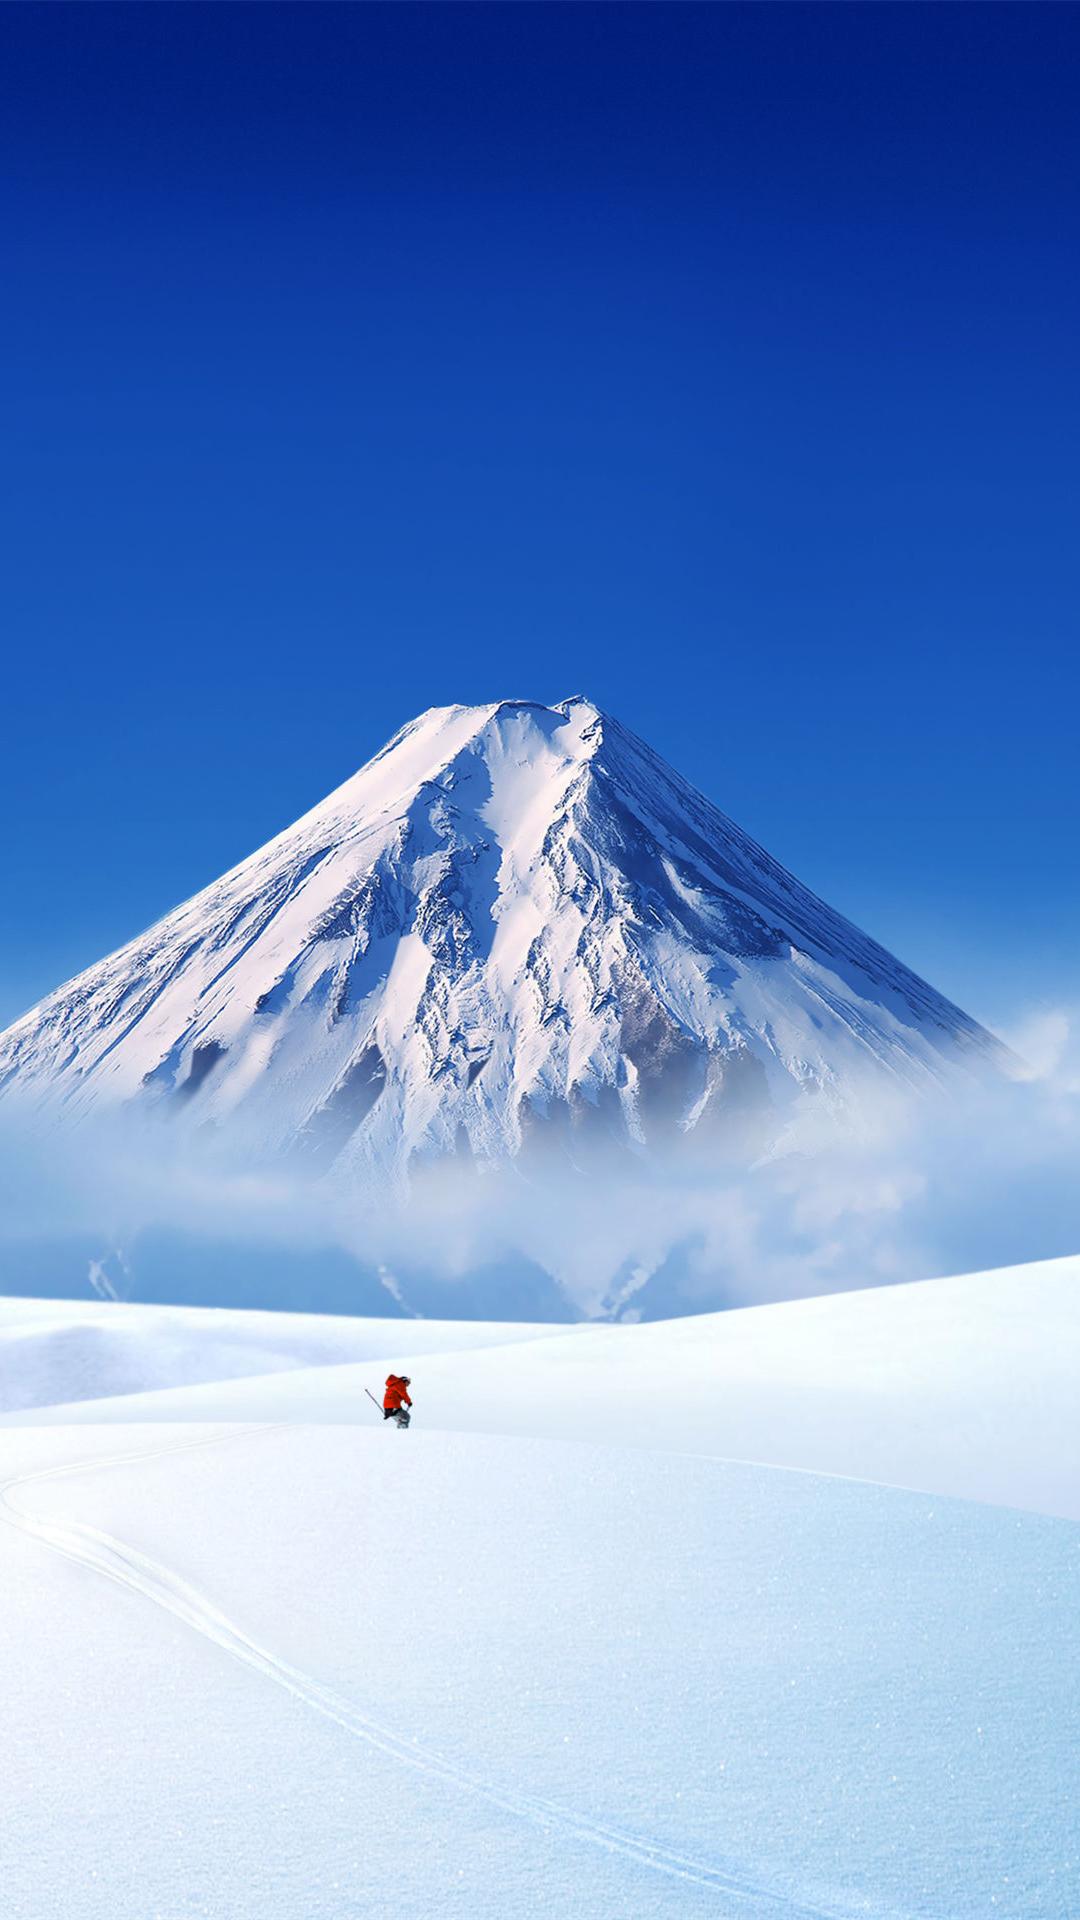 Snow Landscape iphone 6 wallpaper ilikewallpaper com 1080x1920